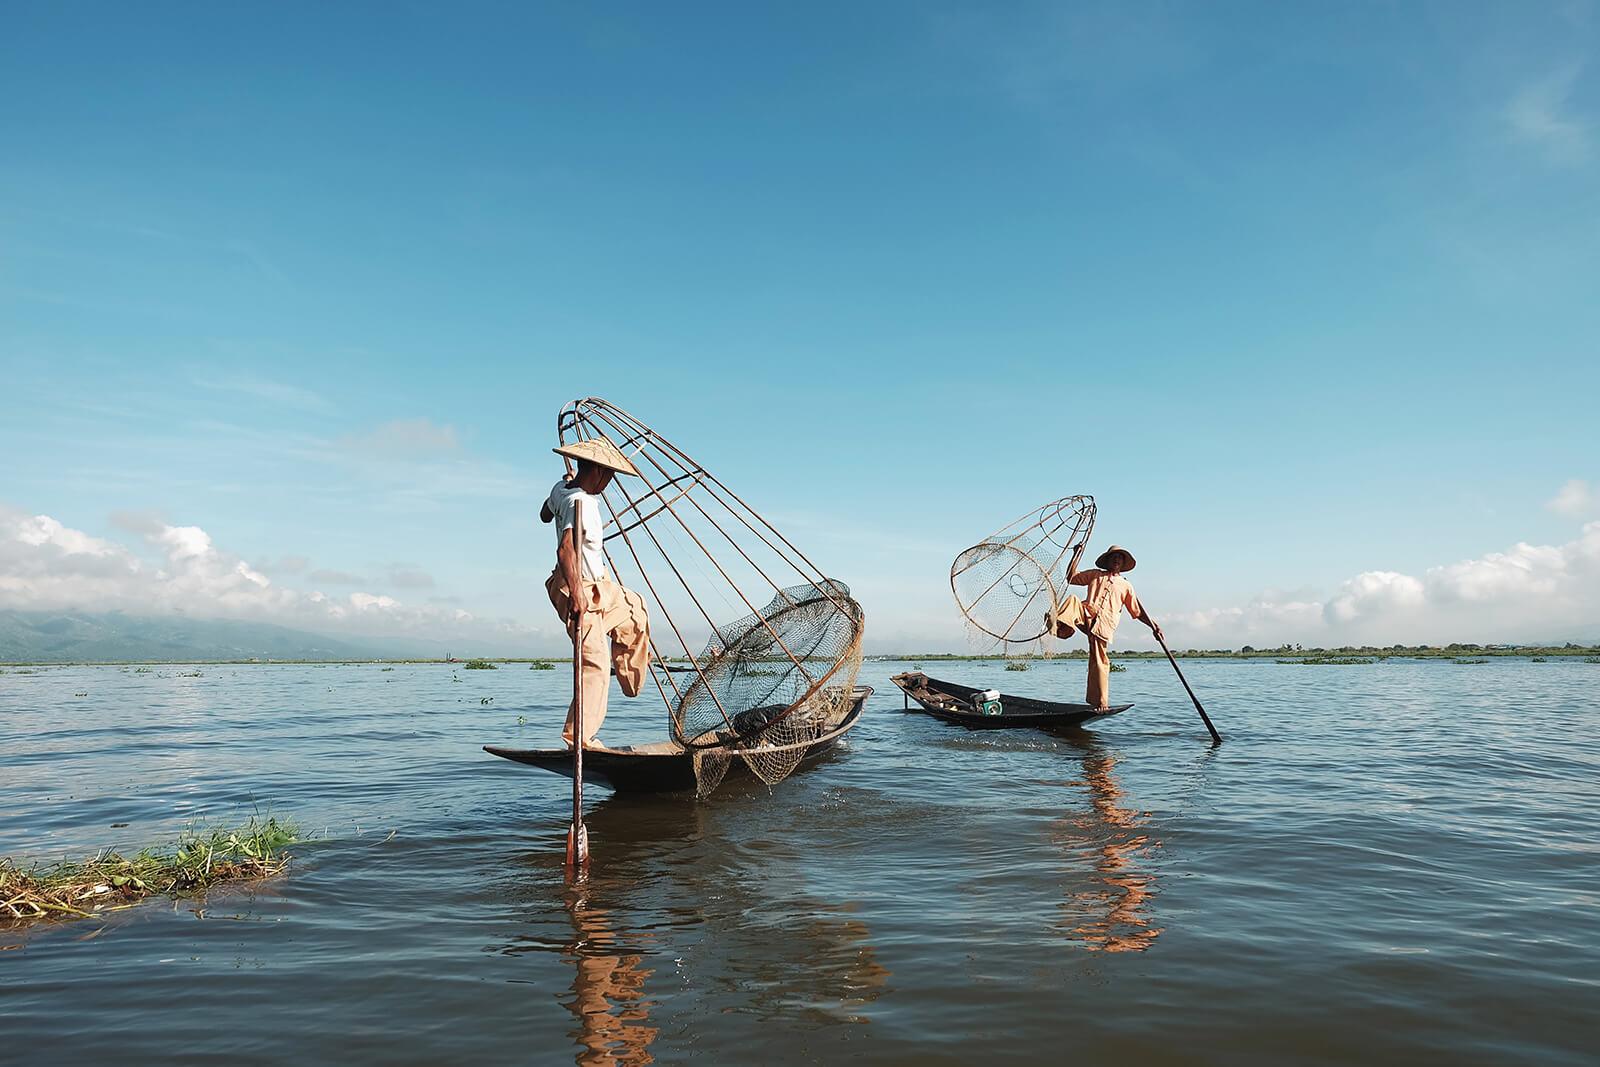 Local fisherman at Inle Lake, Myanmar